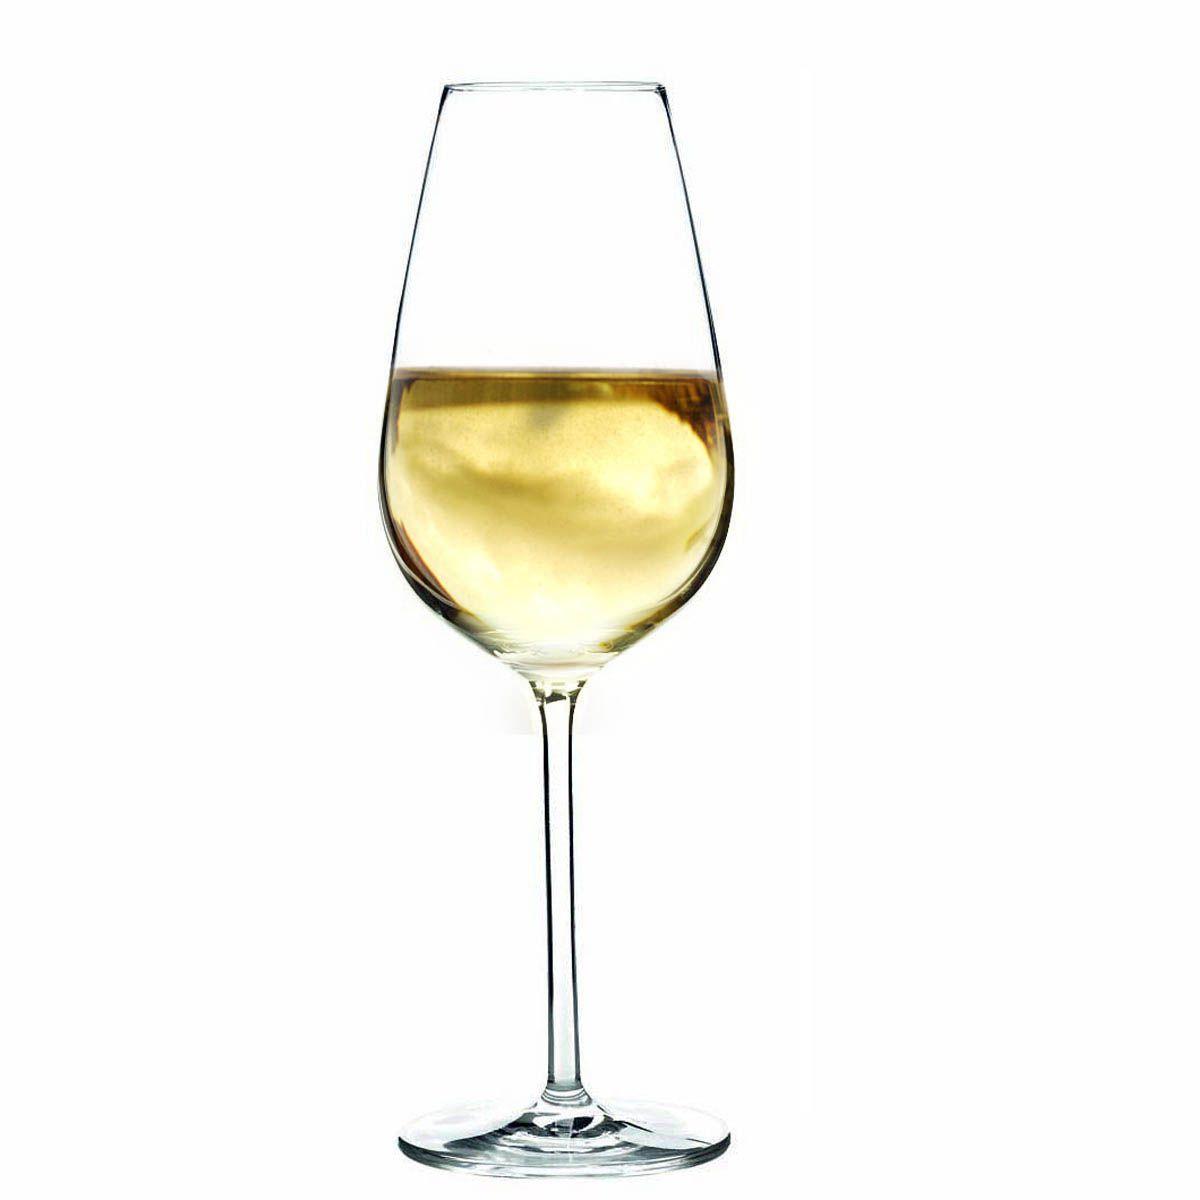 Taça de Vinho Branco Aspergo de Cristal 370ml